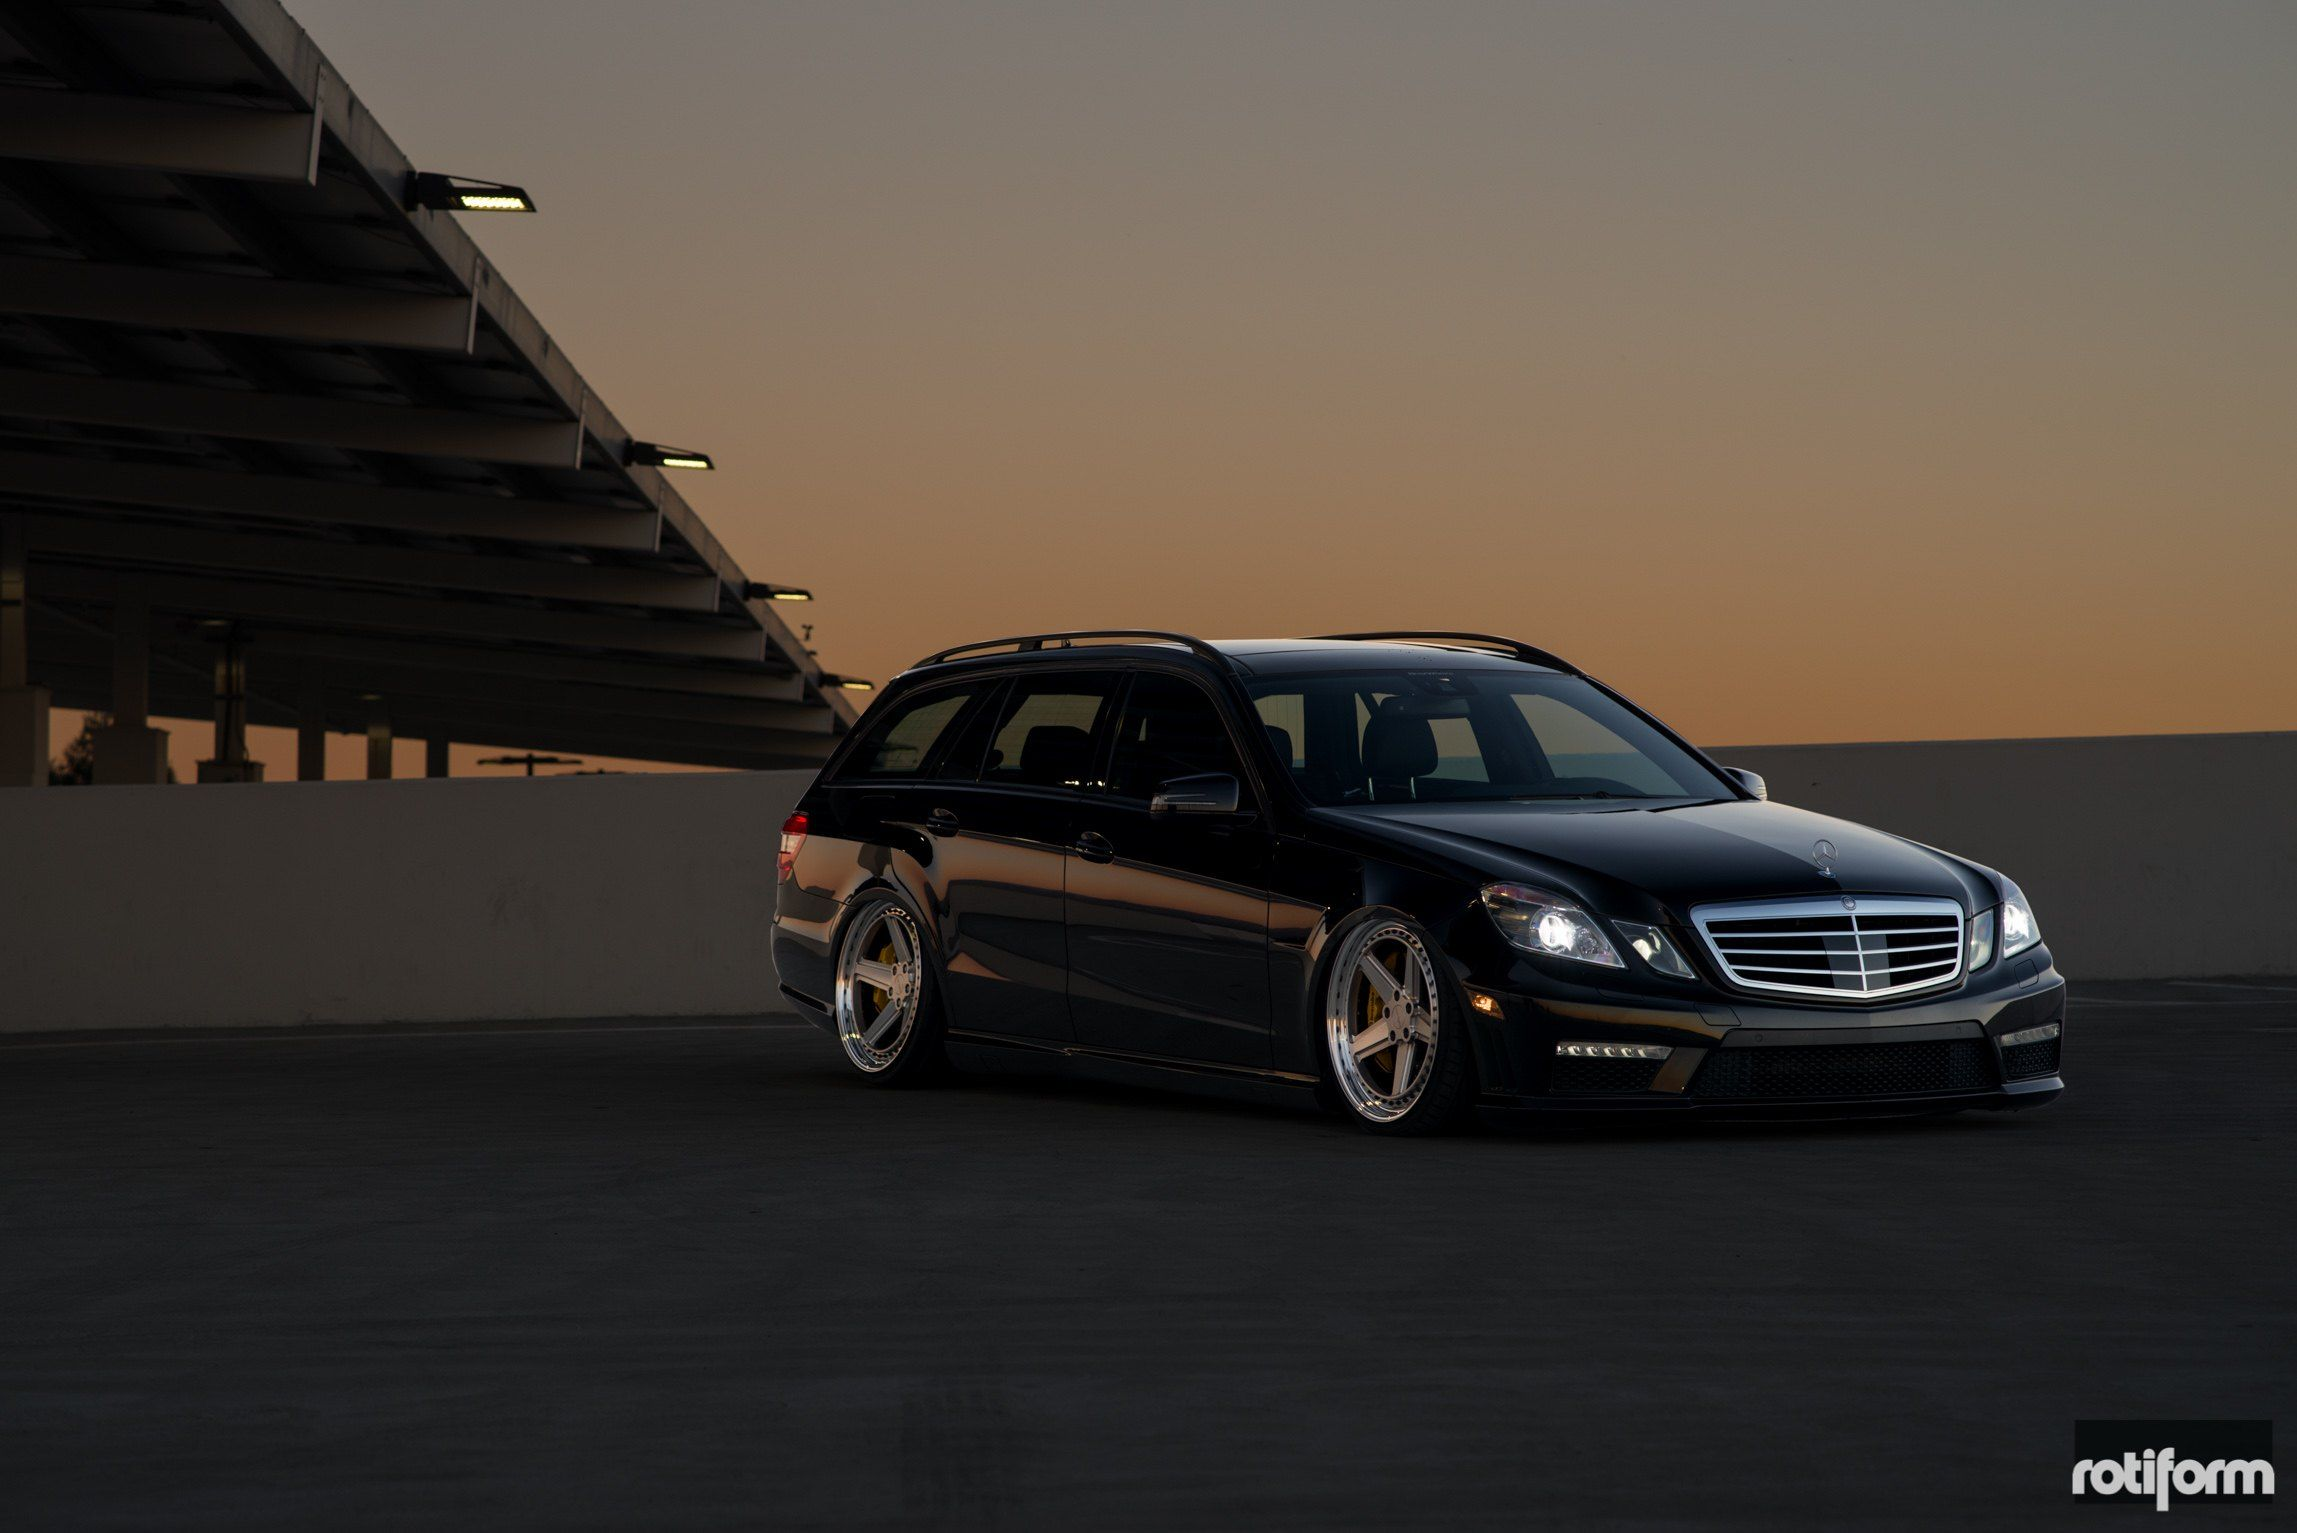 It S Wagon Time Slammed Mercedes E Class Wagon Sitting On Rotiform Rims Rotiform Rotiform Wheels Merc Benz